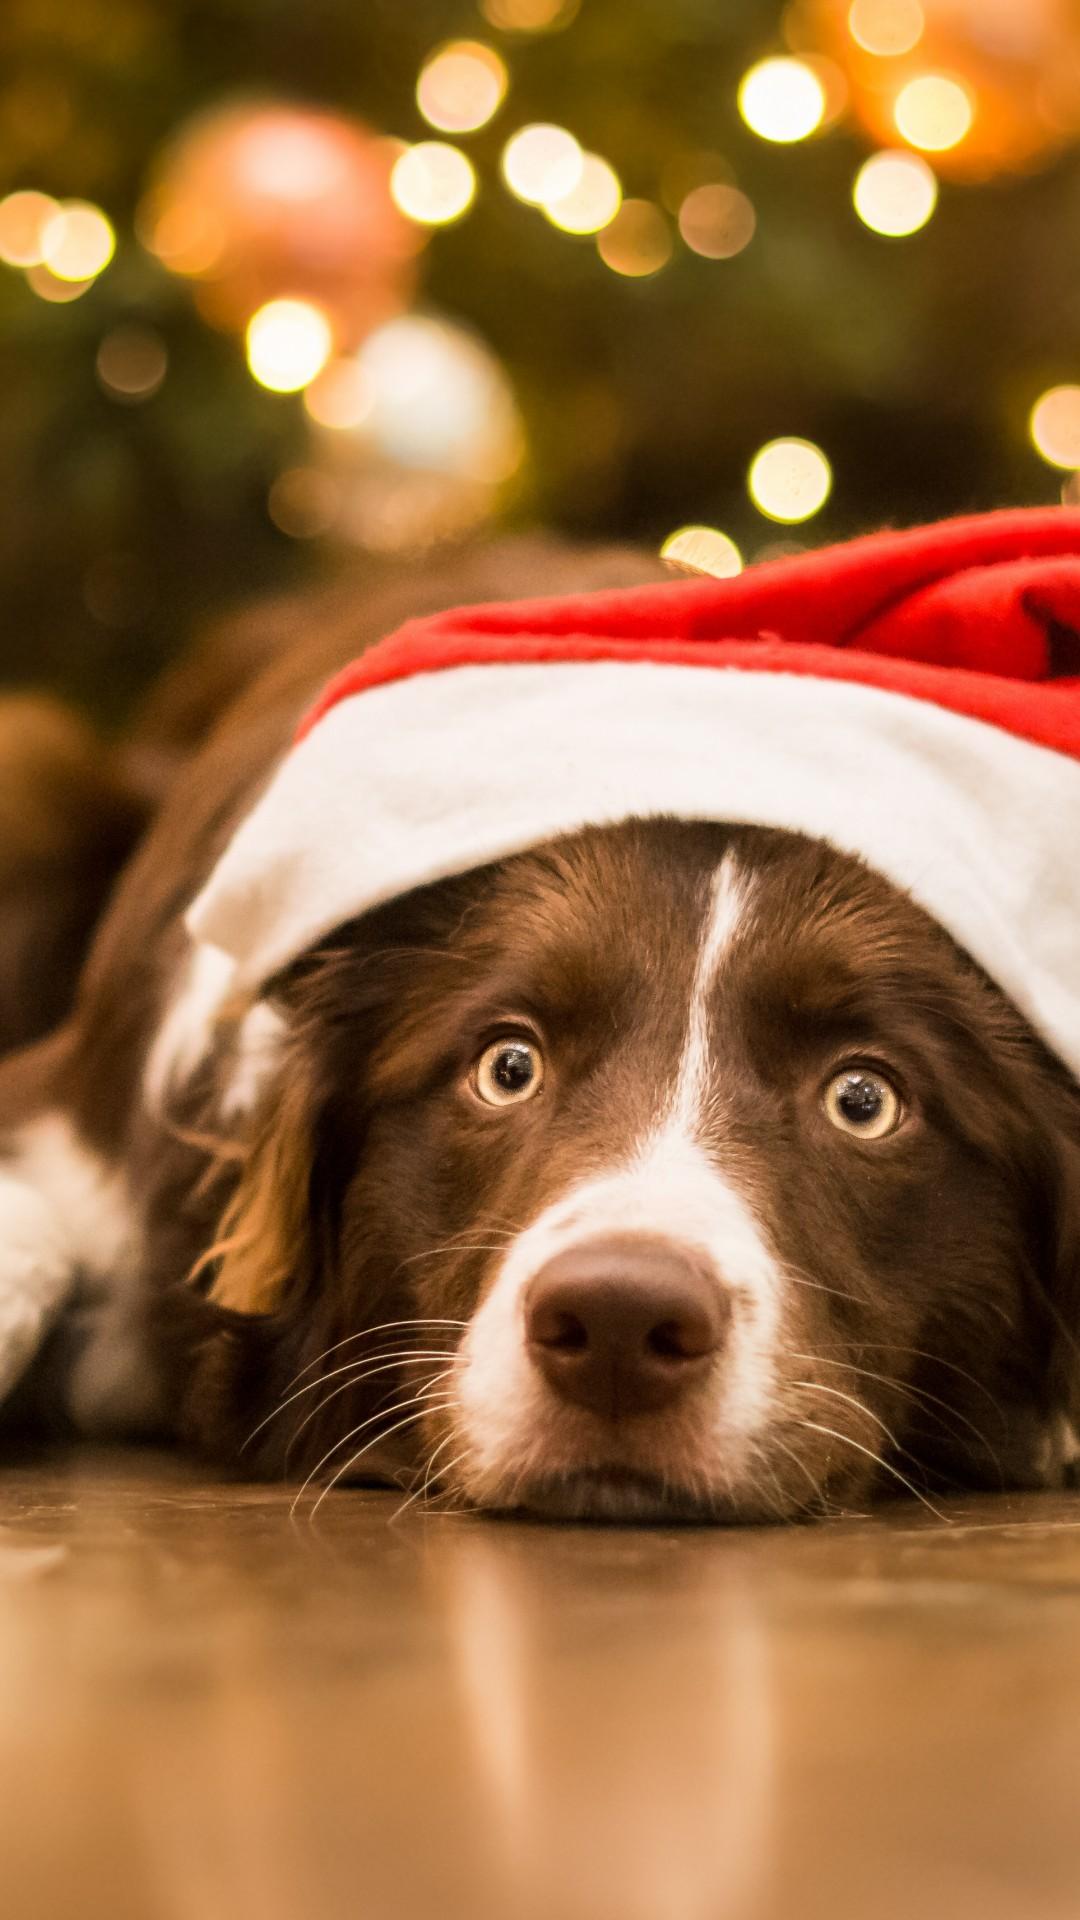 Wallpaper Christmas, New Year, dog, cute animals, 5k ...